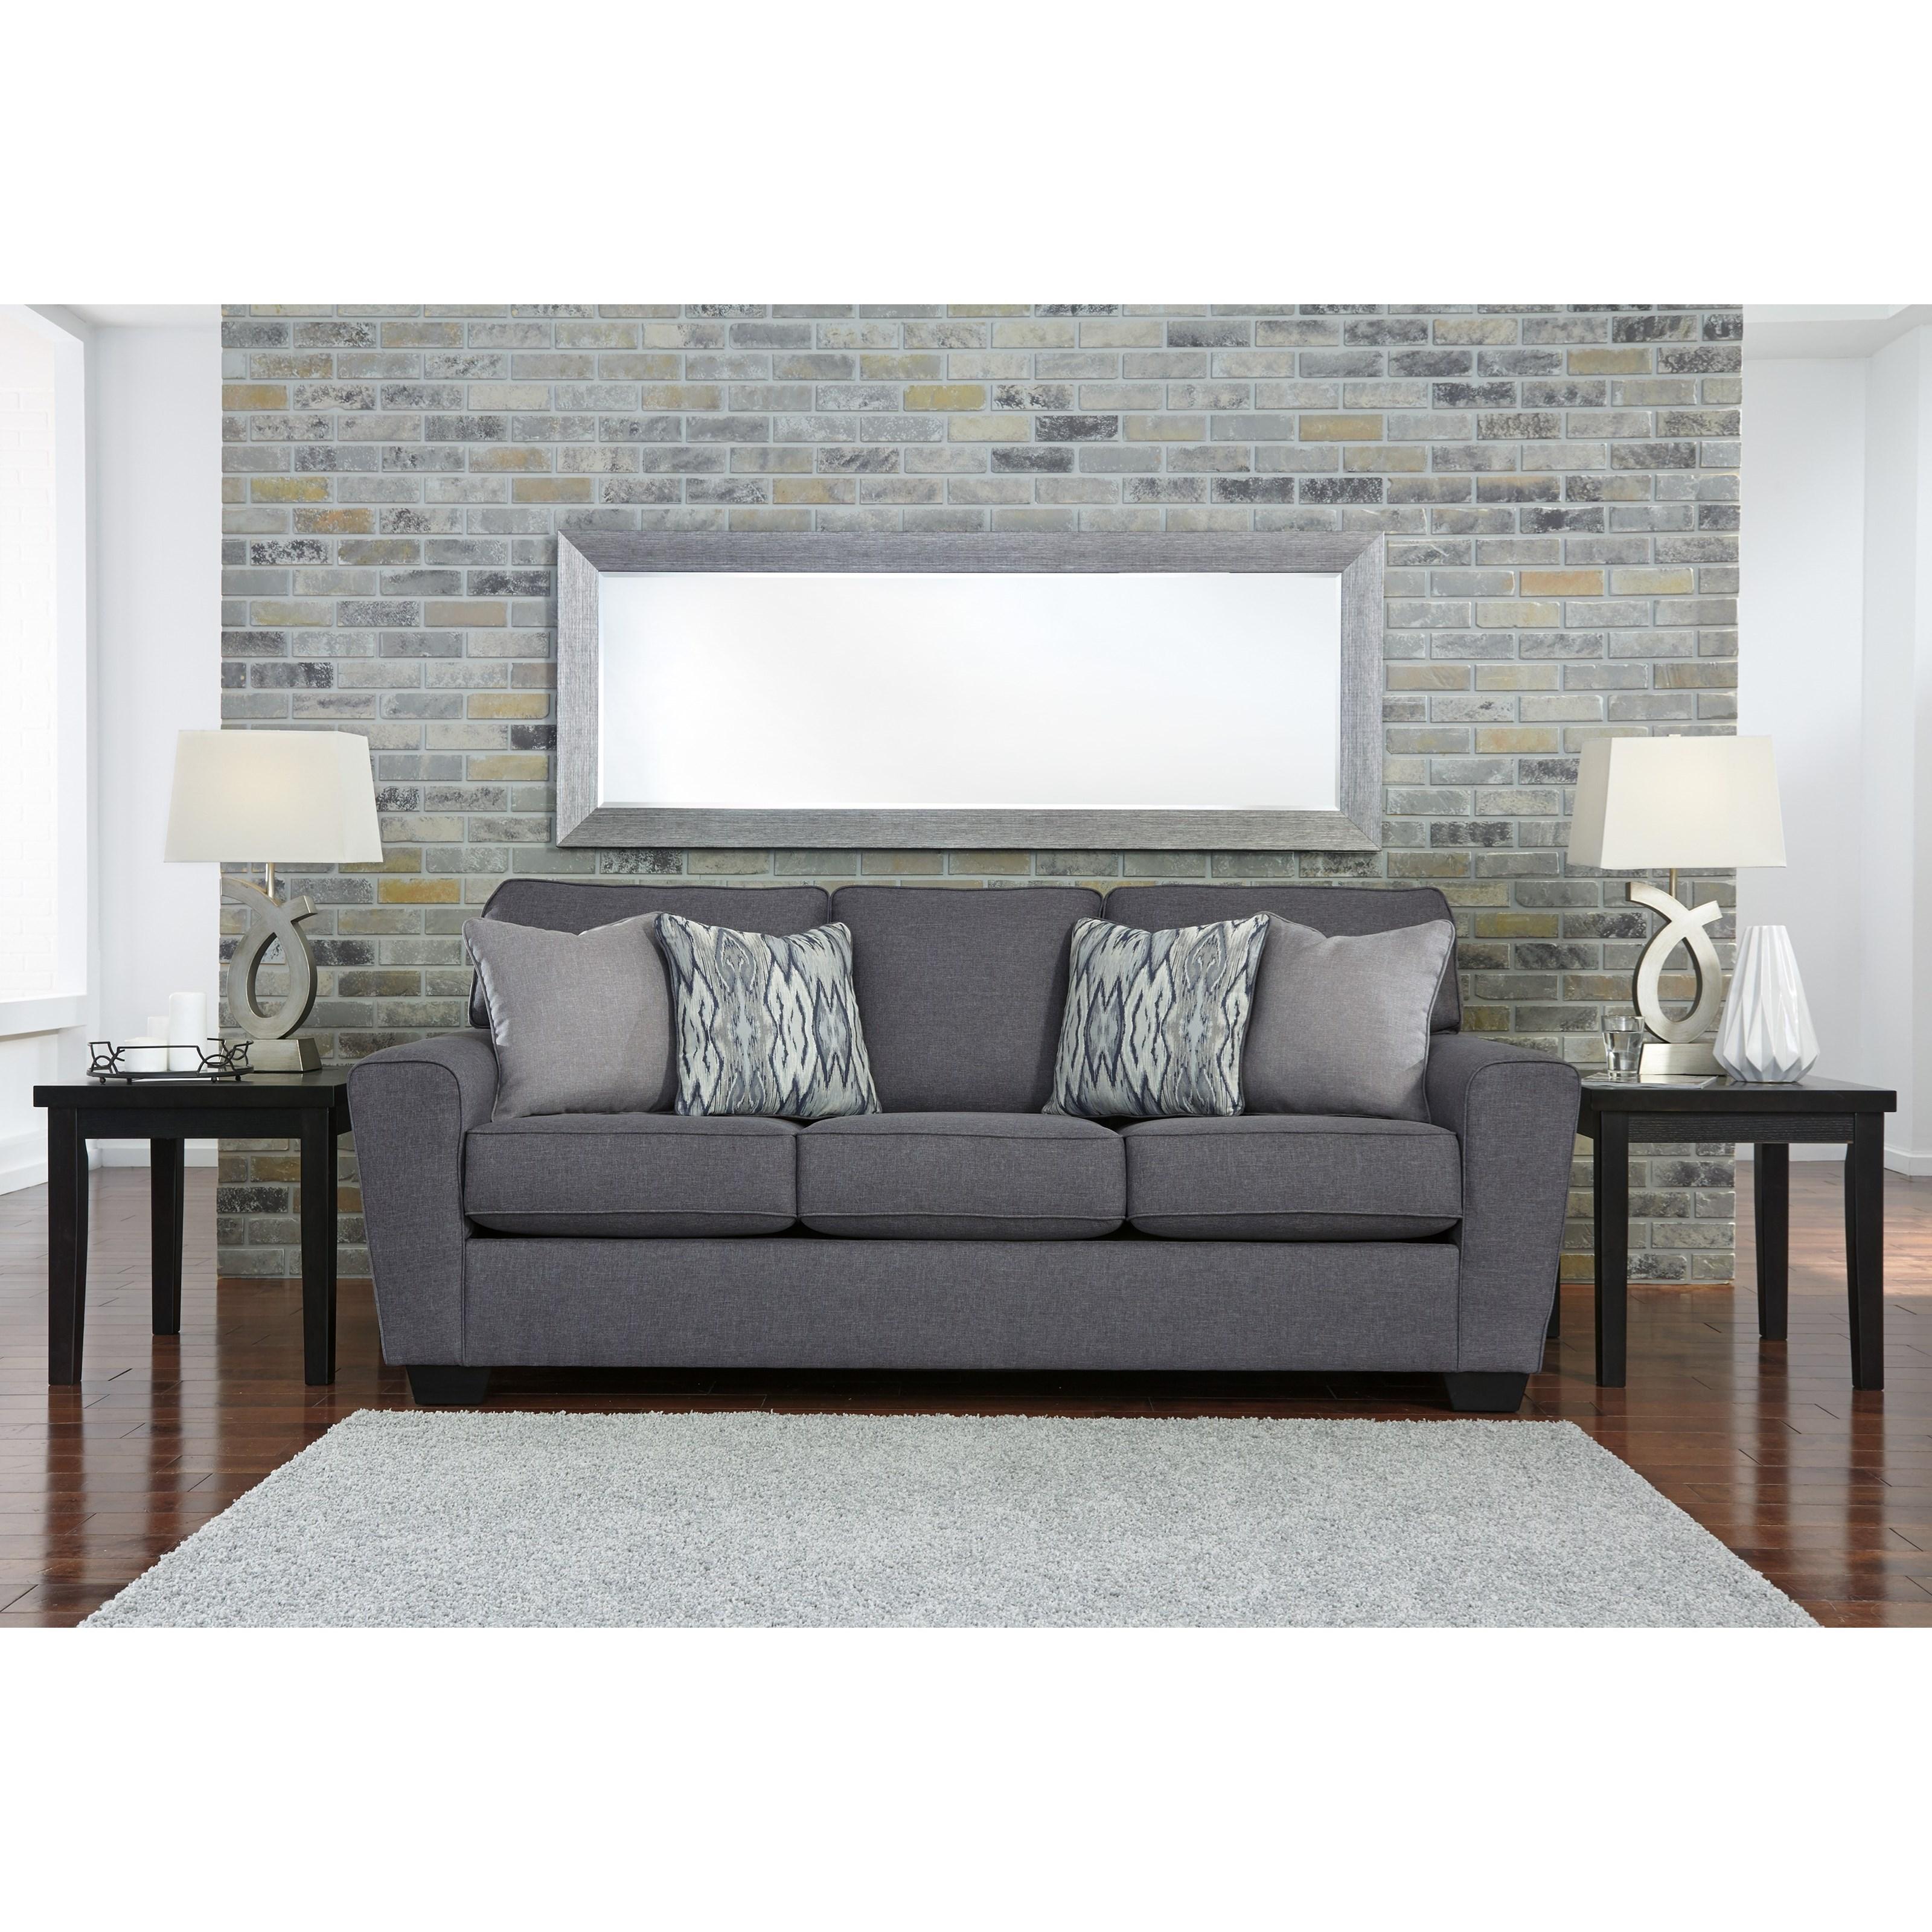 ashley furniture calion 2070238 contemporary sofa